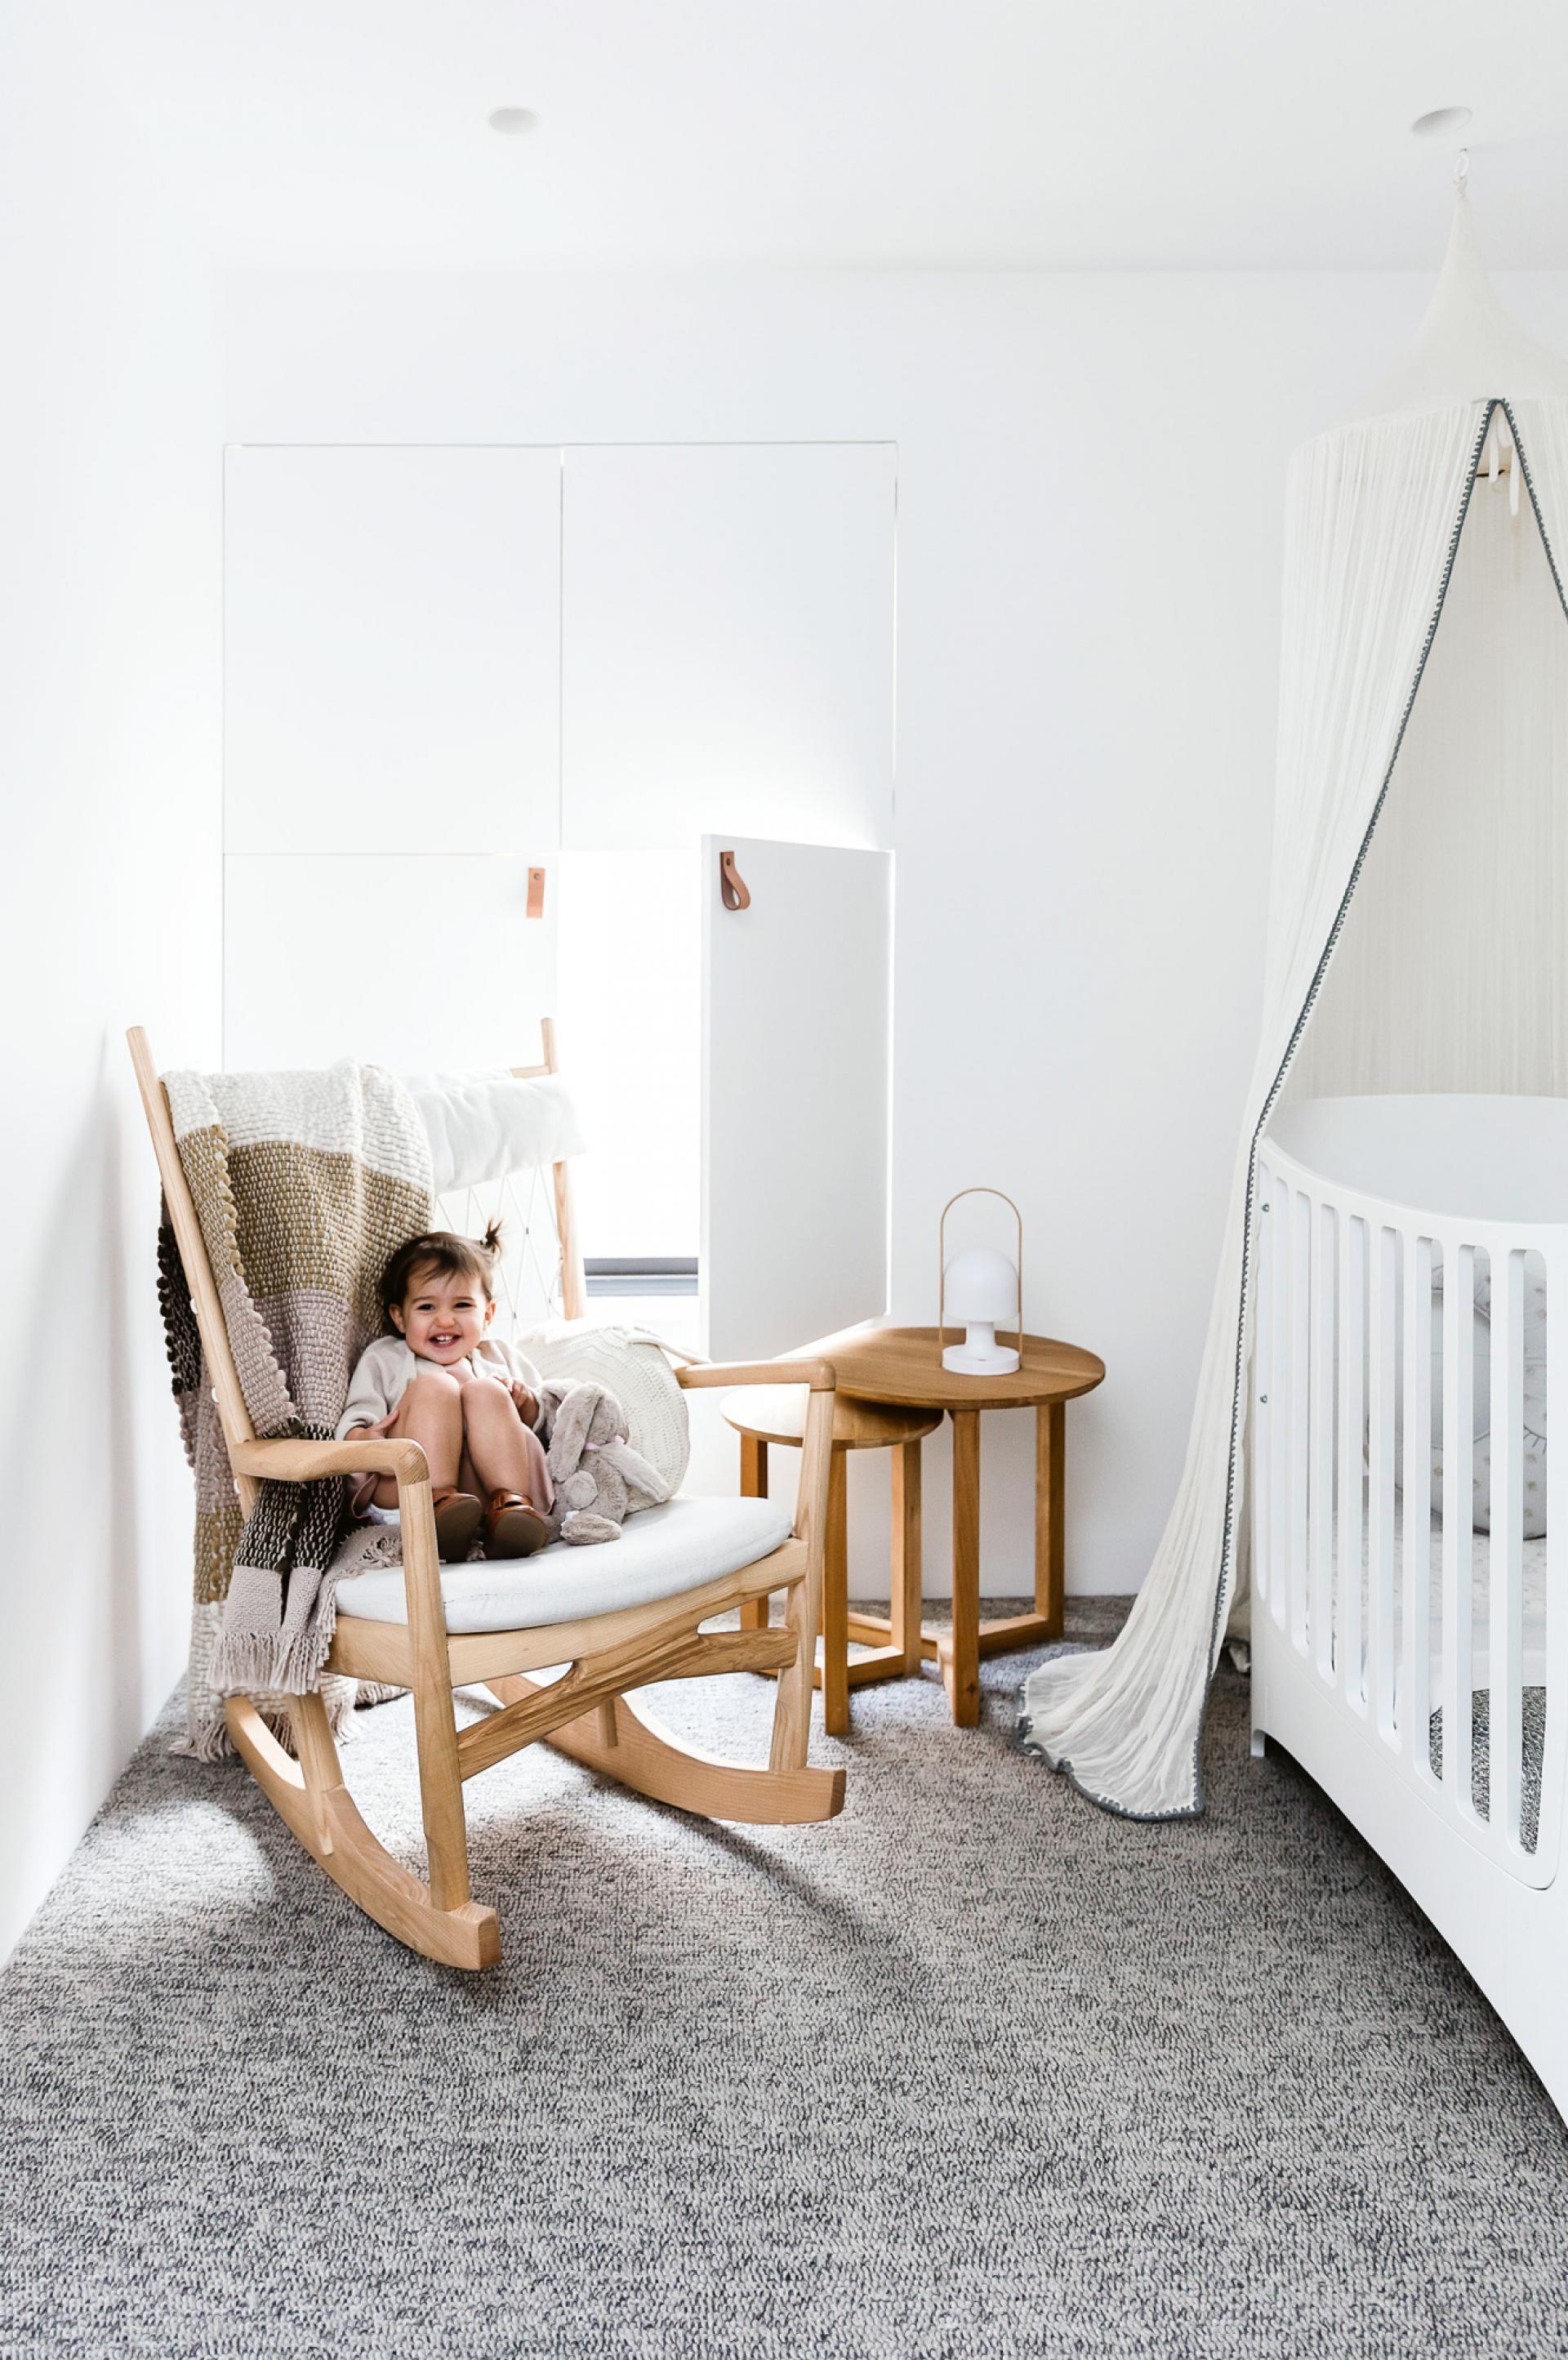 australisch-familie-interieur-kinderkamer